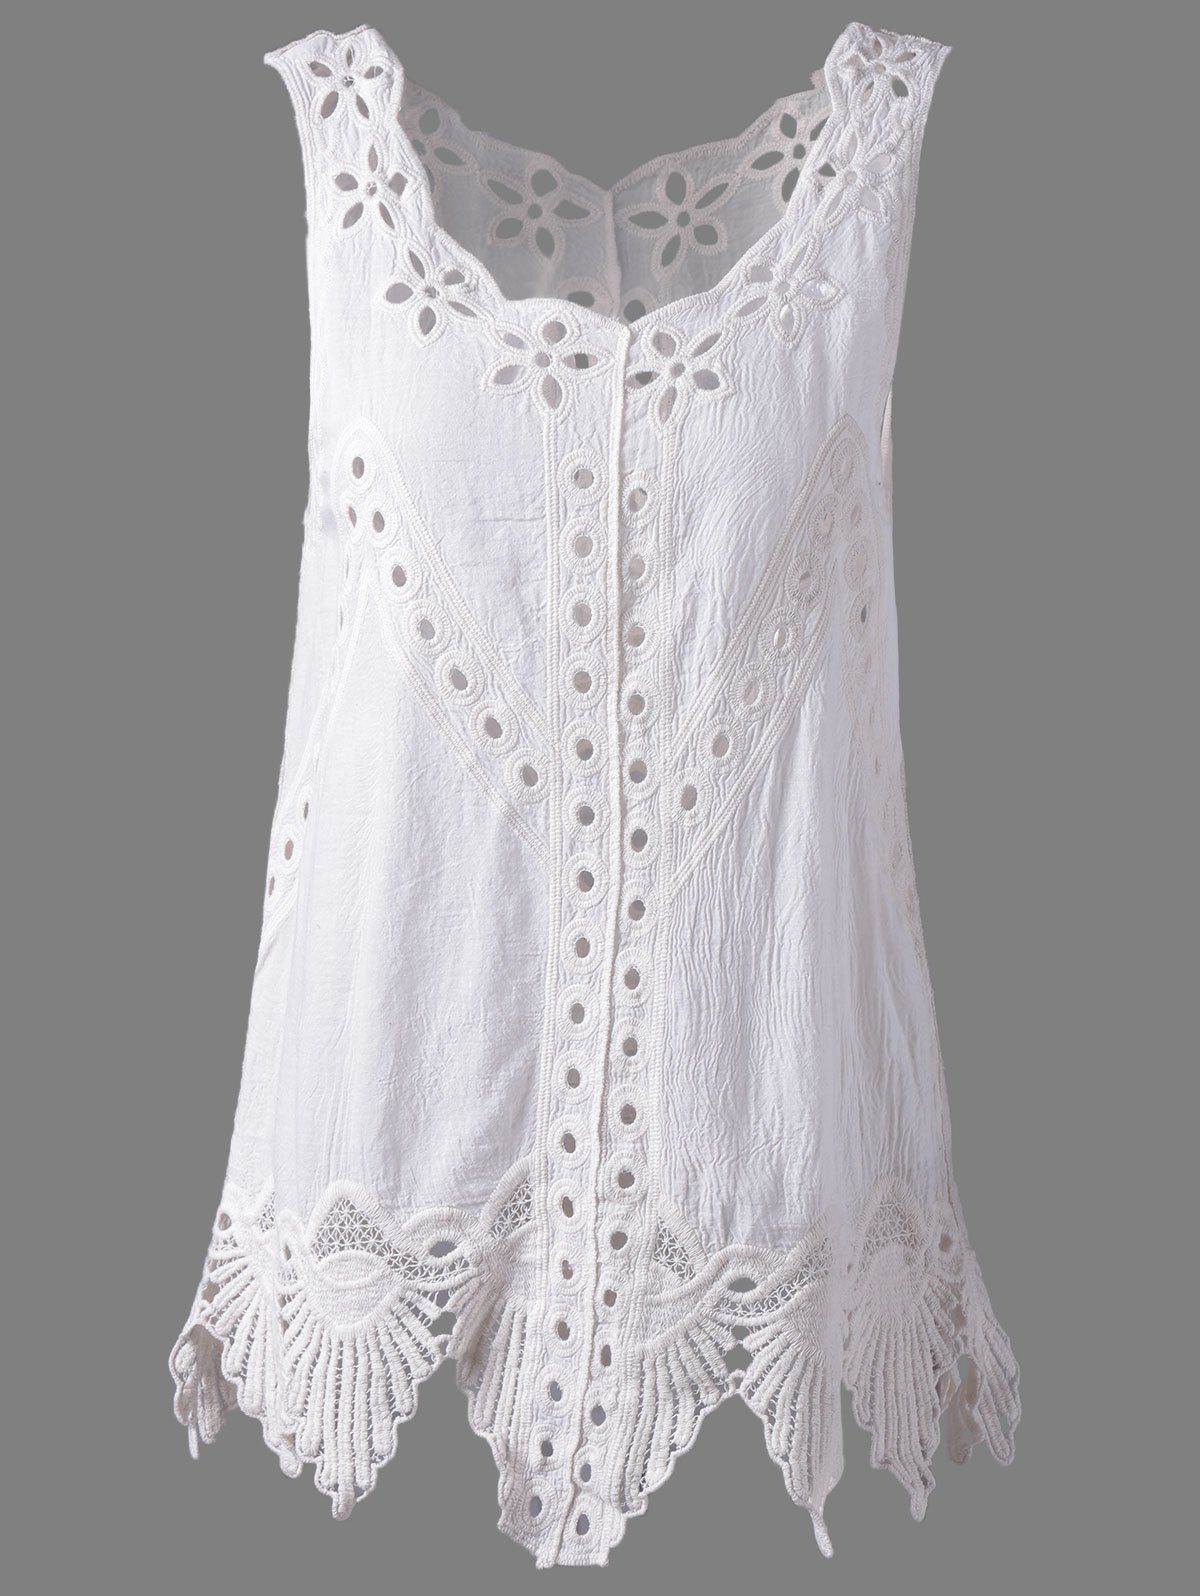 eae27f9122864 Bohemian Scoop Neck Solid Color Crochet Sleeveless Blouse For Women ...